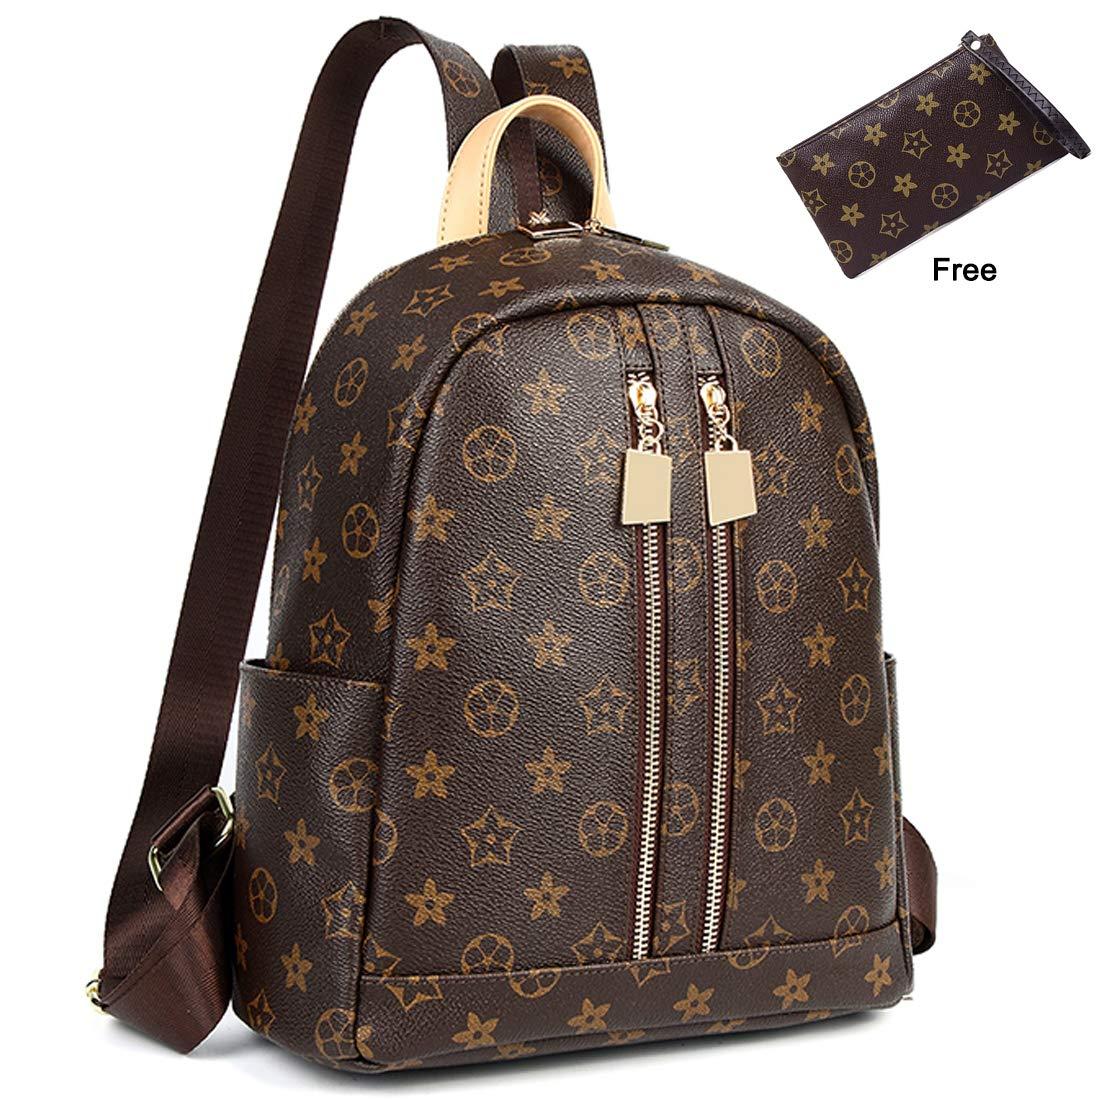 ZUNIYAMAMA Casual Purse Fashion School Leather Backpack Crossbady Shoulder Bag Mini Backpack for Women & Teenage Girls brown waterproof Handbag